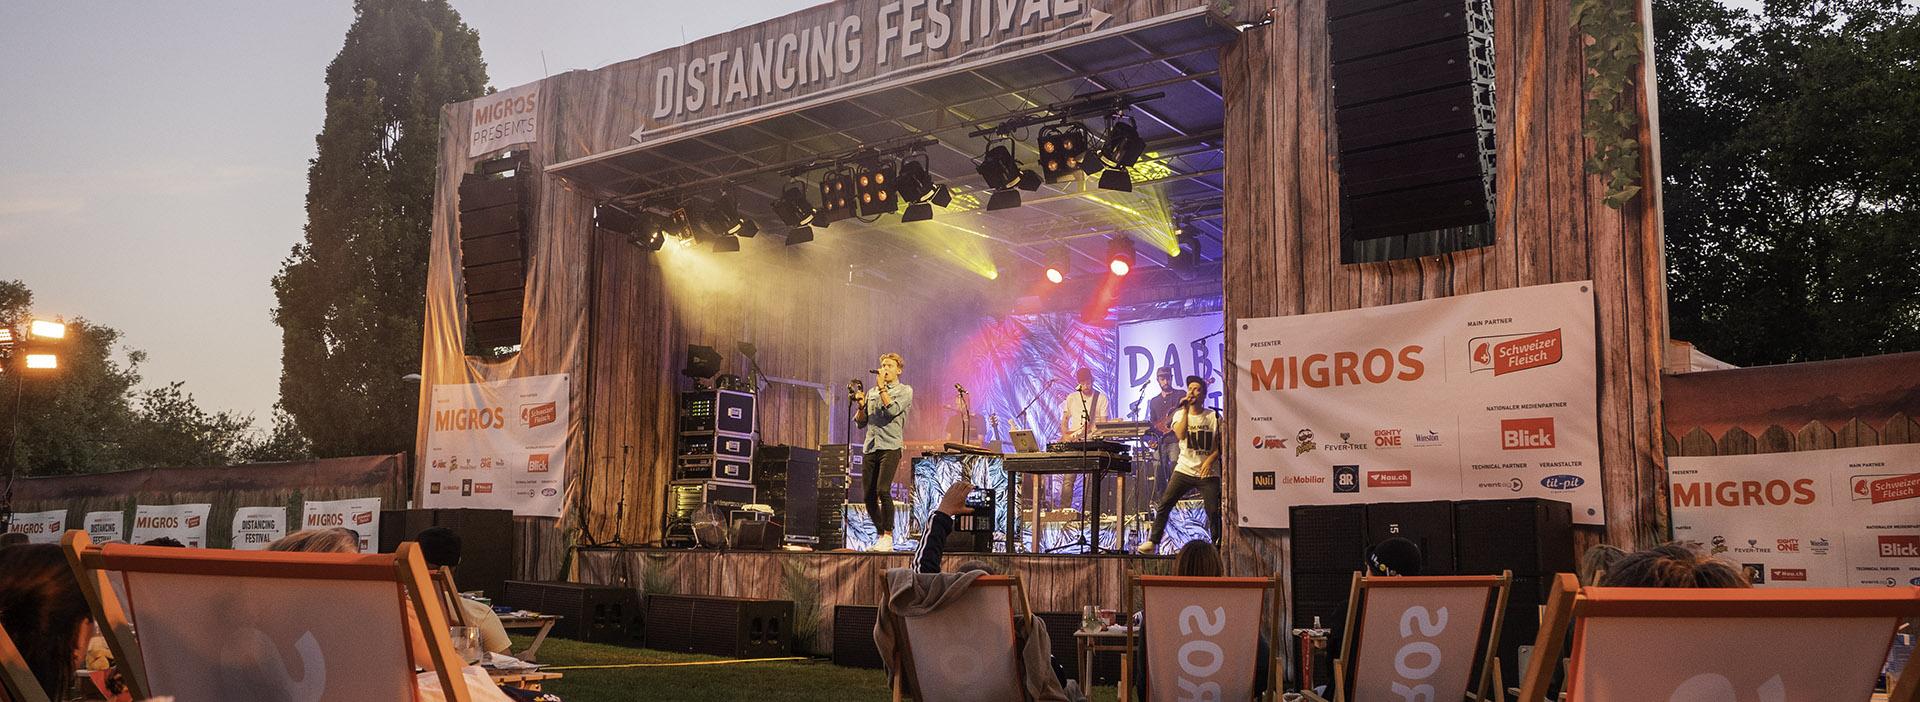 Distancing Festival